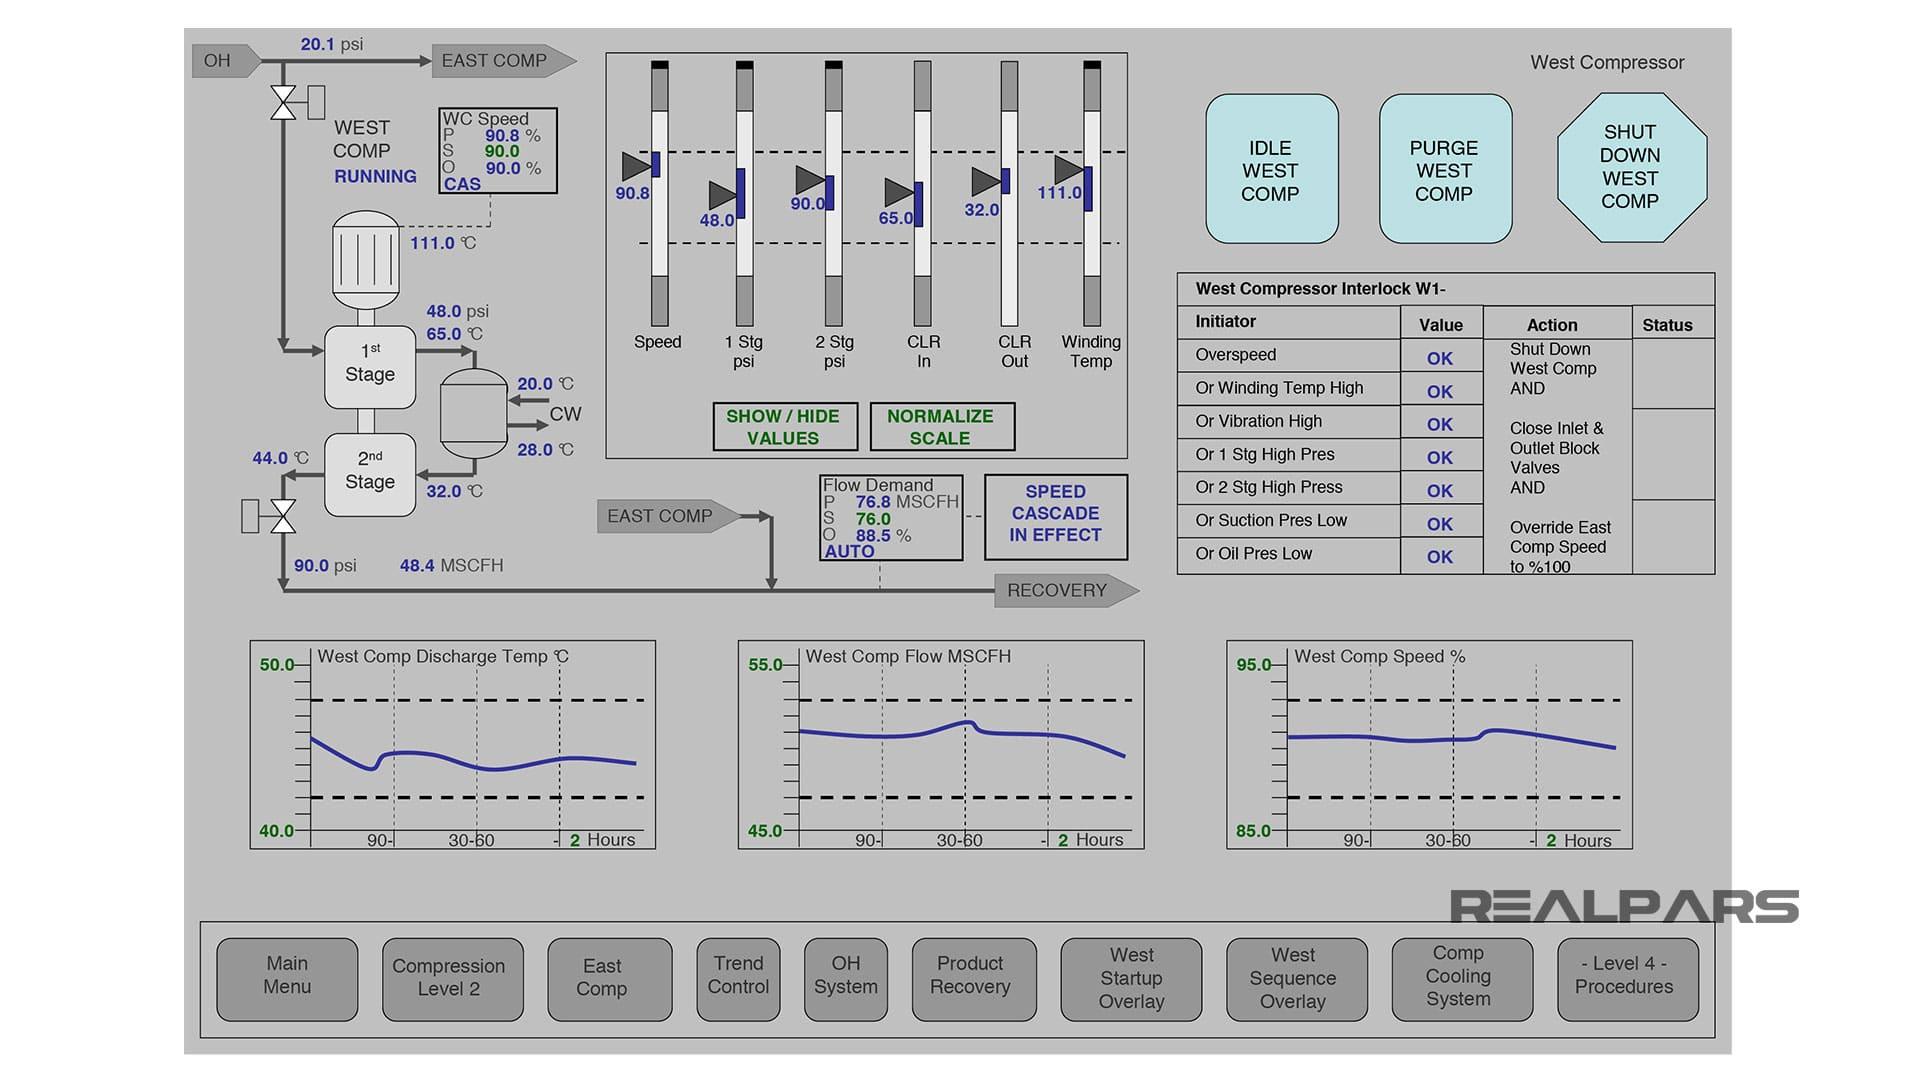 HMI-Level-3-display